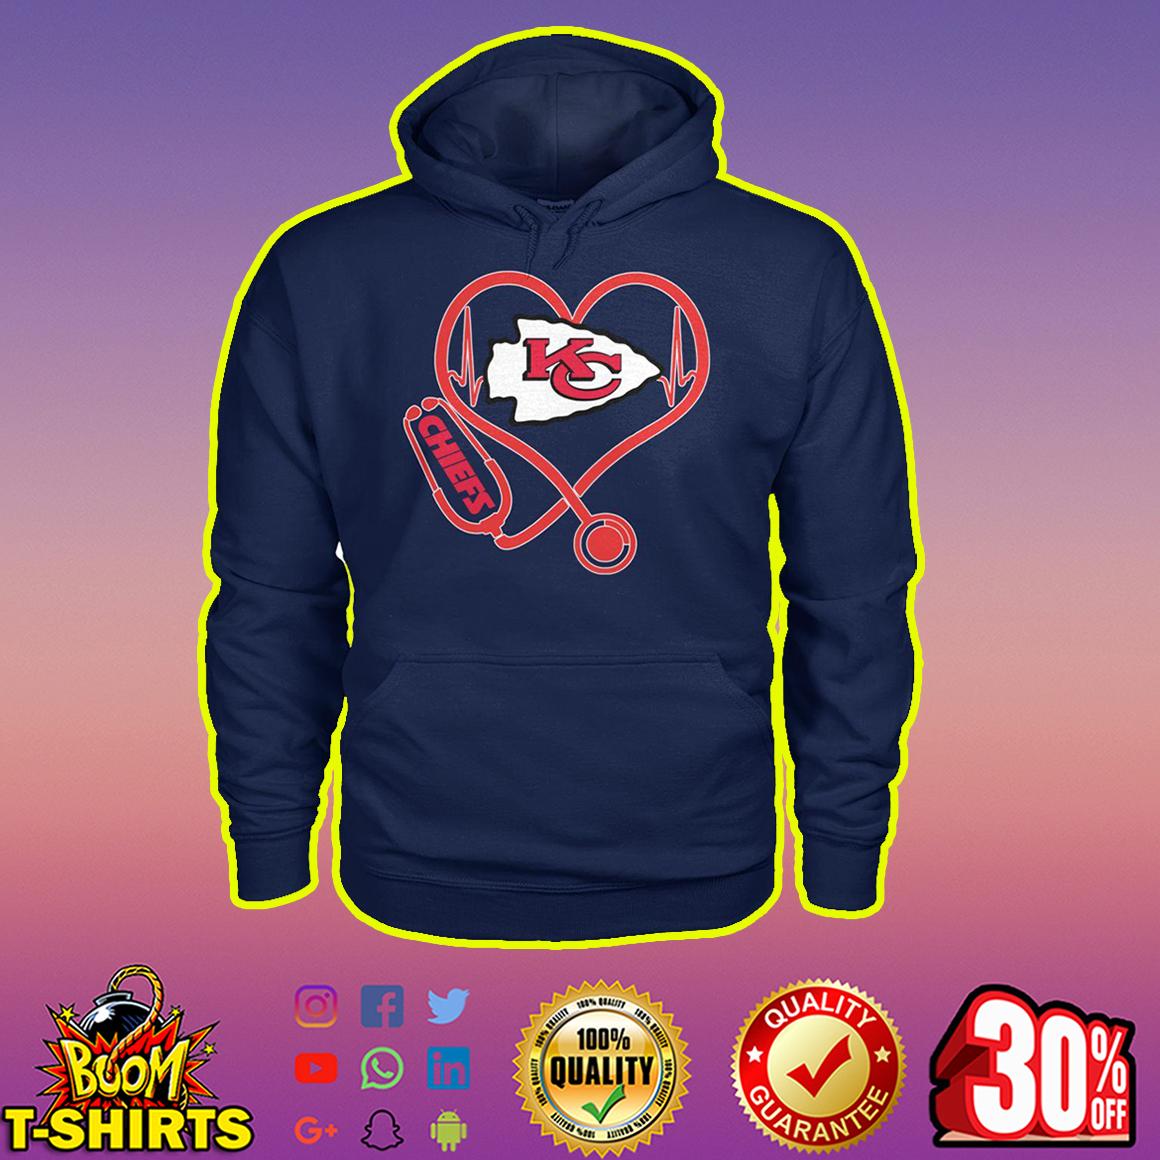 Stethoscope Kansas City Chiefs hoodie